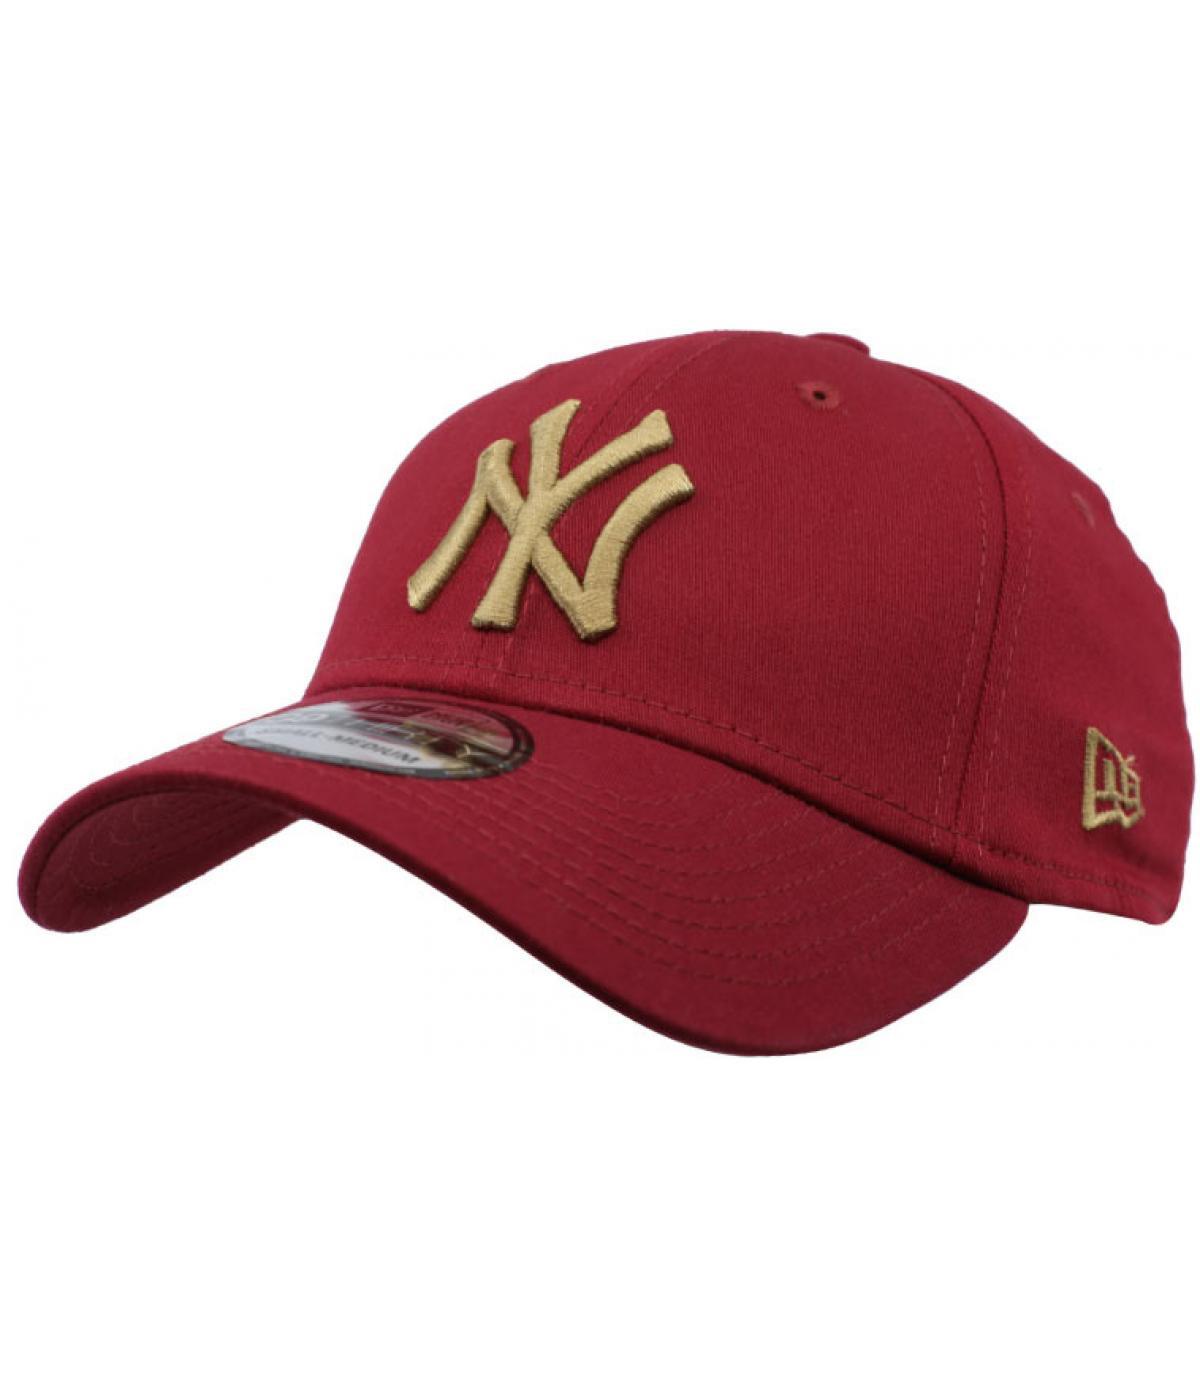 Details League Ess NY 3930 cardinal wheat - afbeeling 2